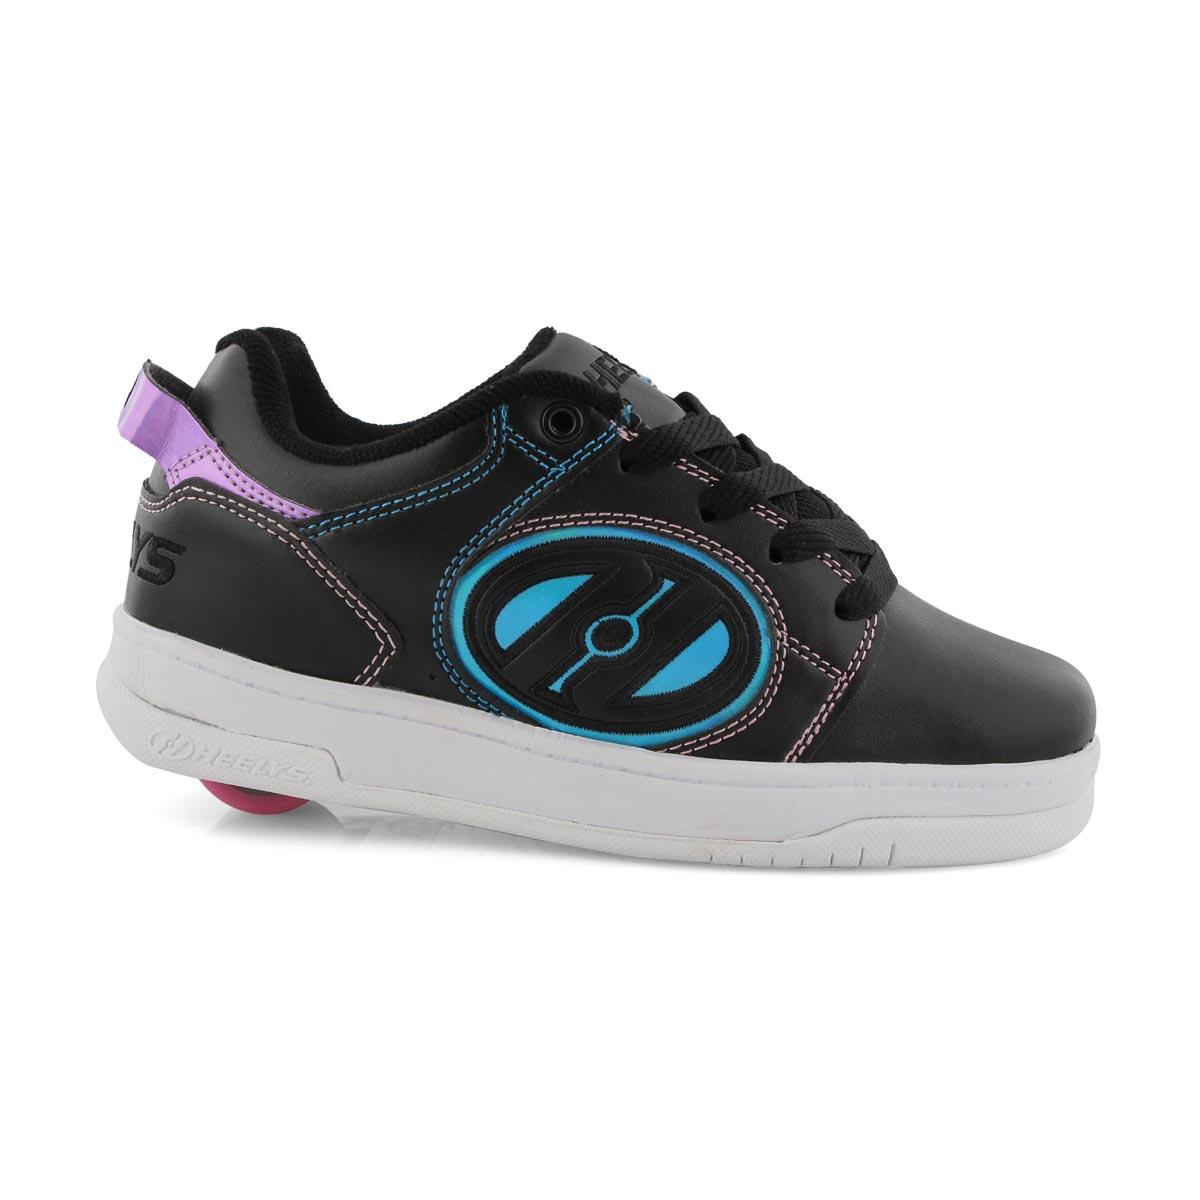 Grls Voyager bk/pk laceup skate sneaker